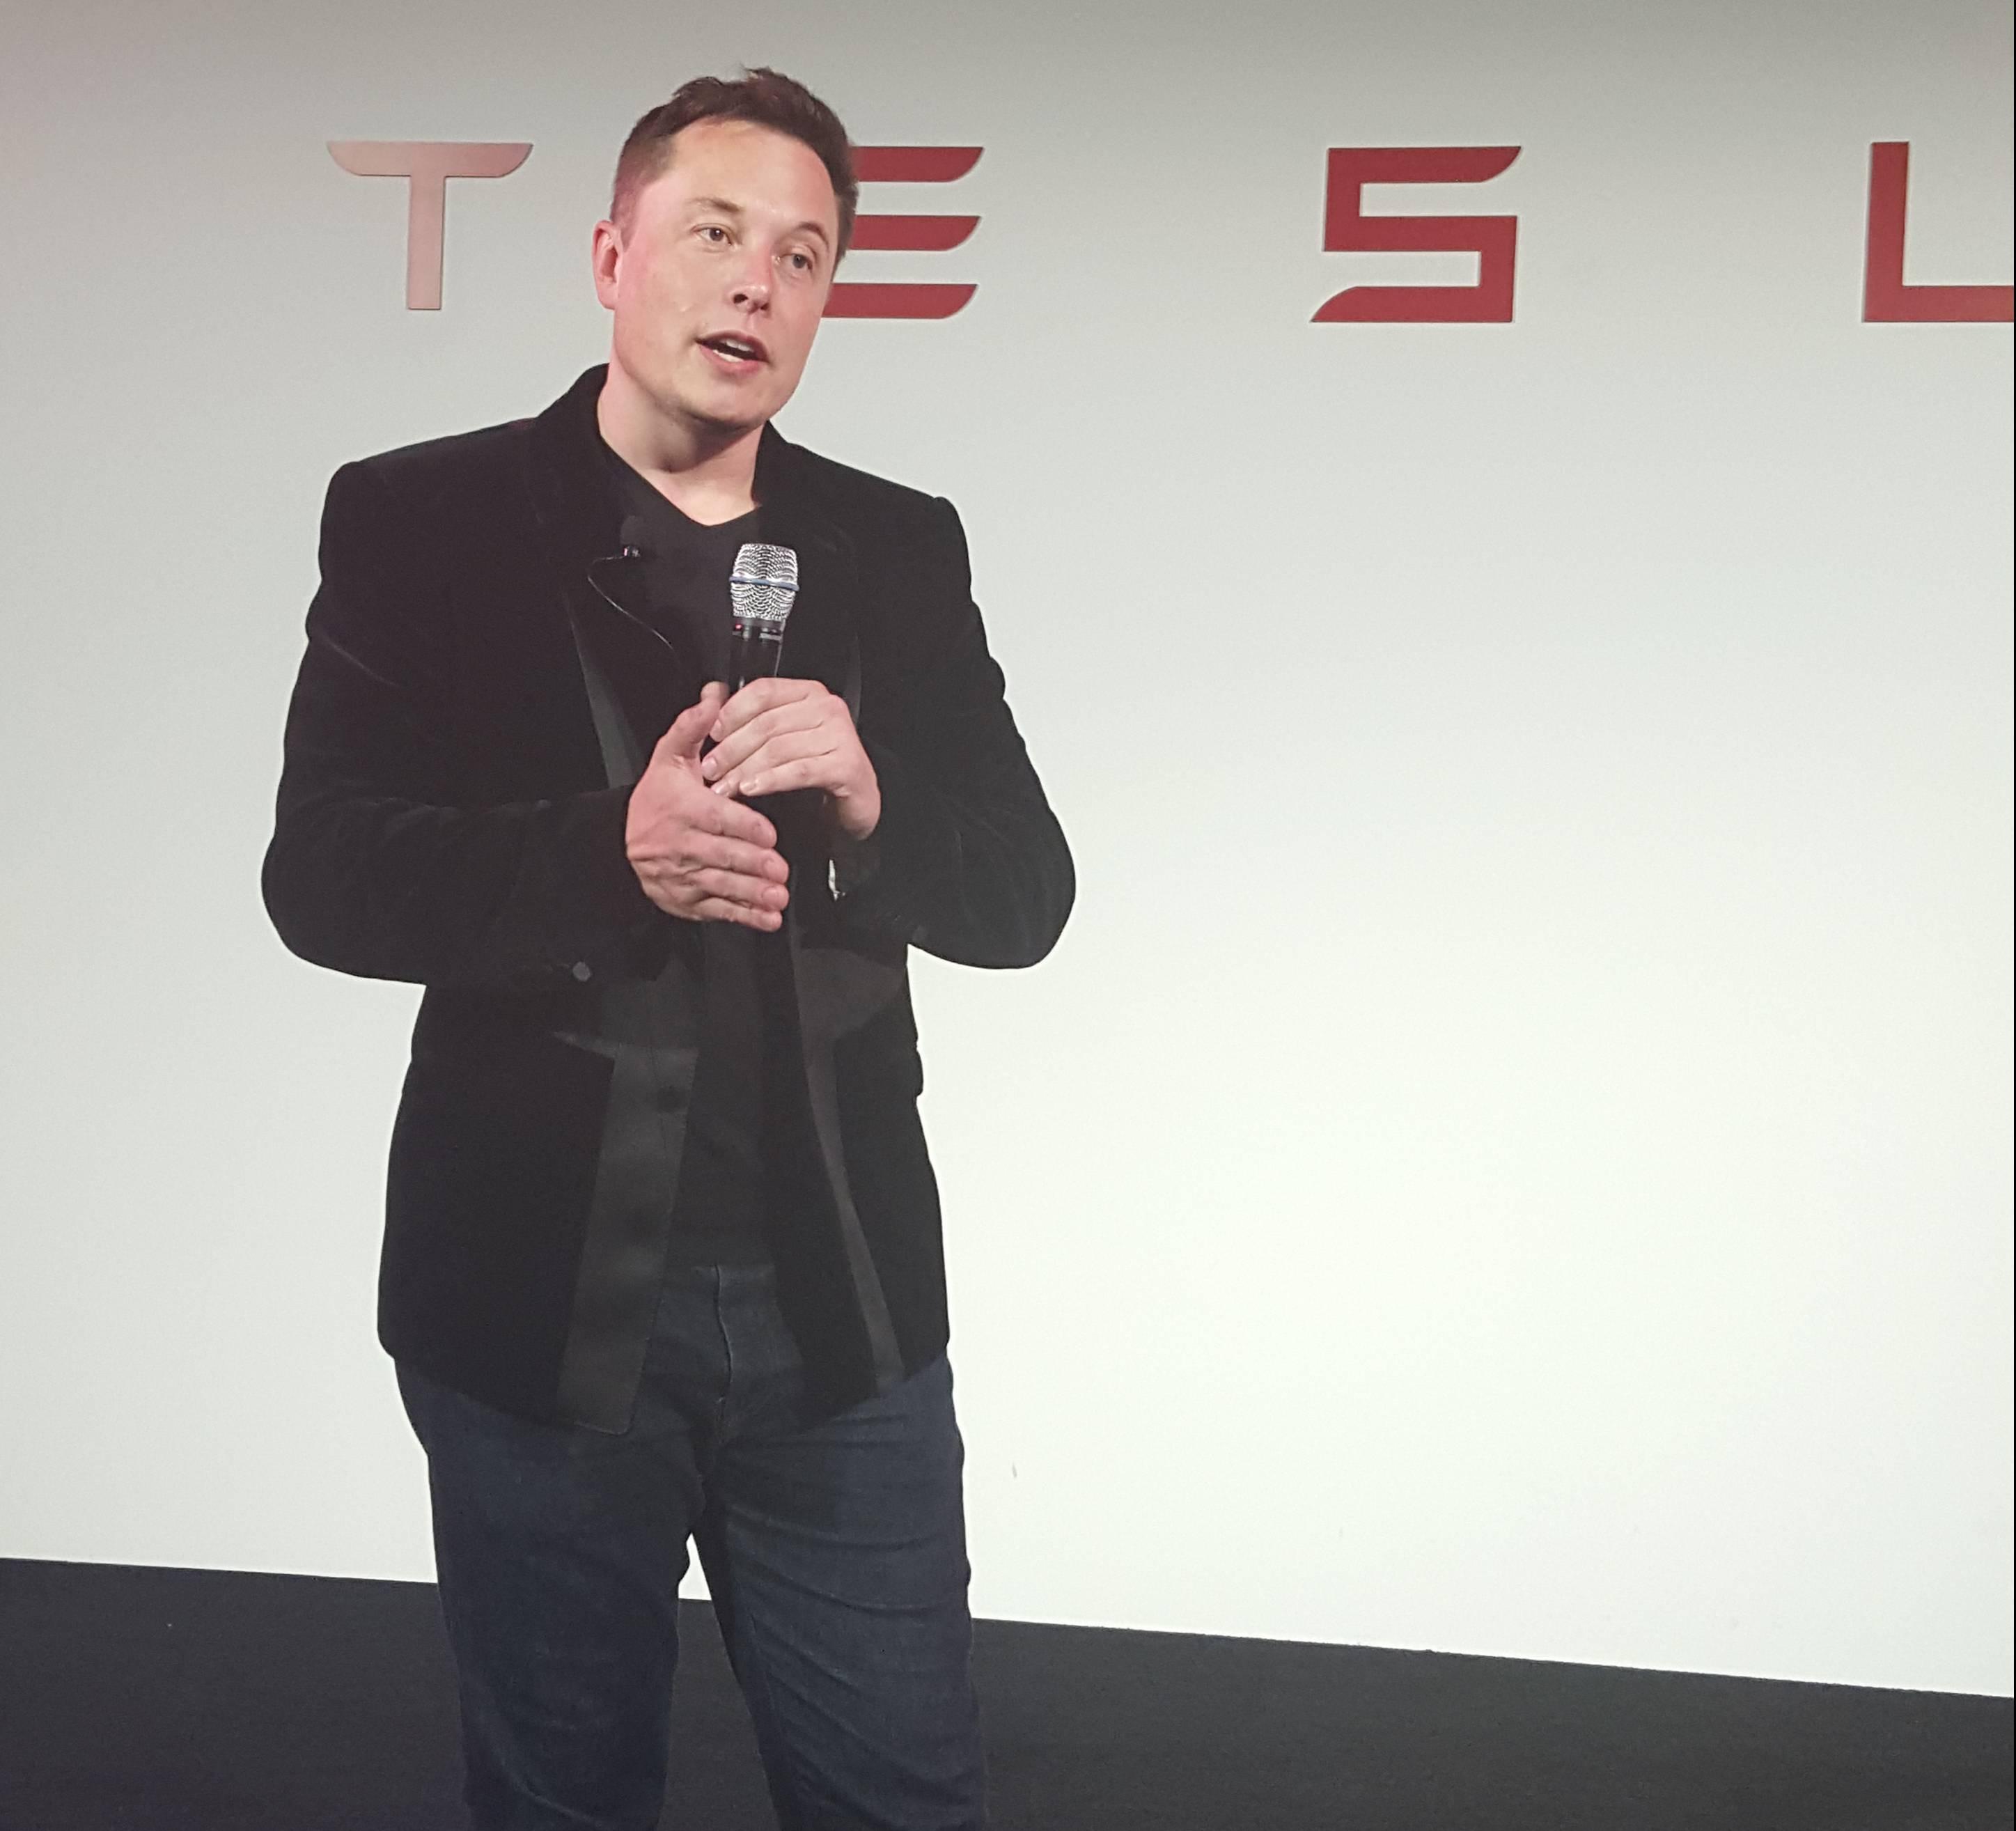 Elon Musk at Tesla' Model X launch on September 29